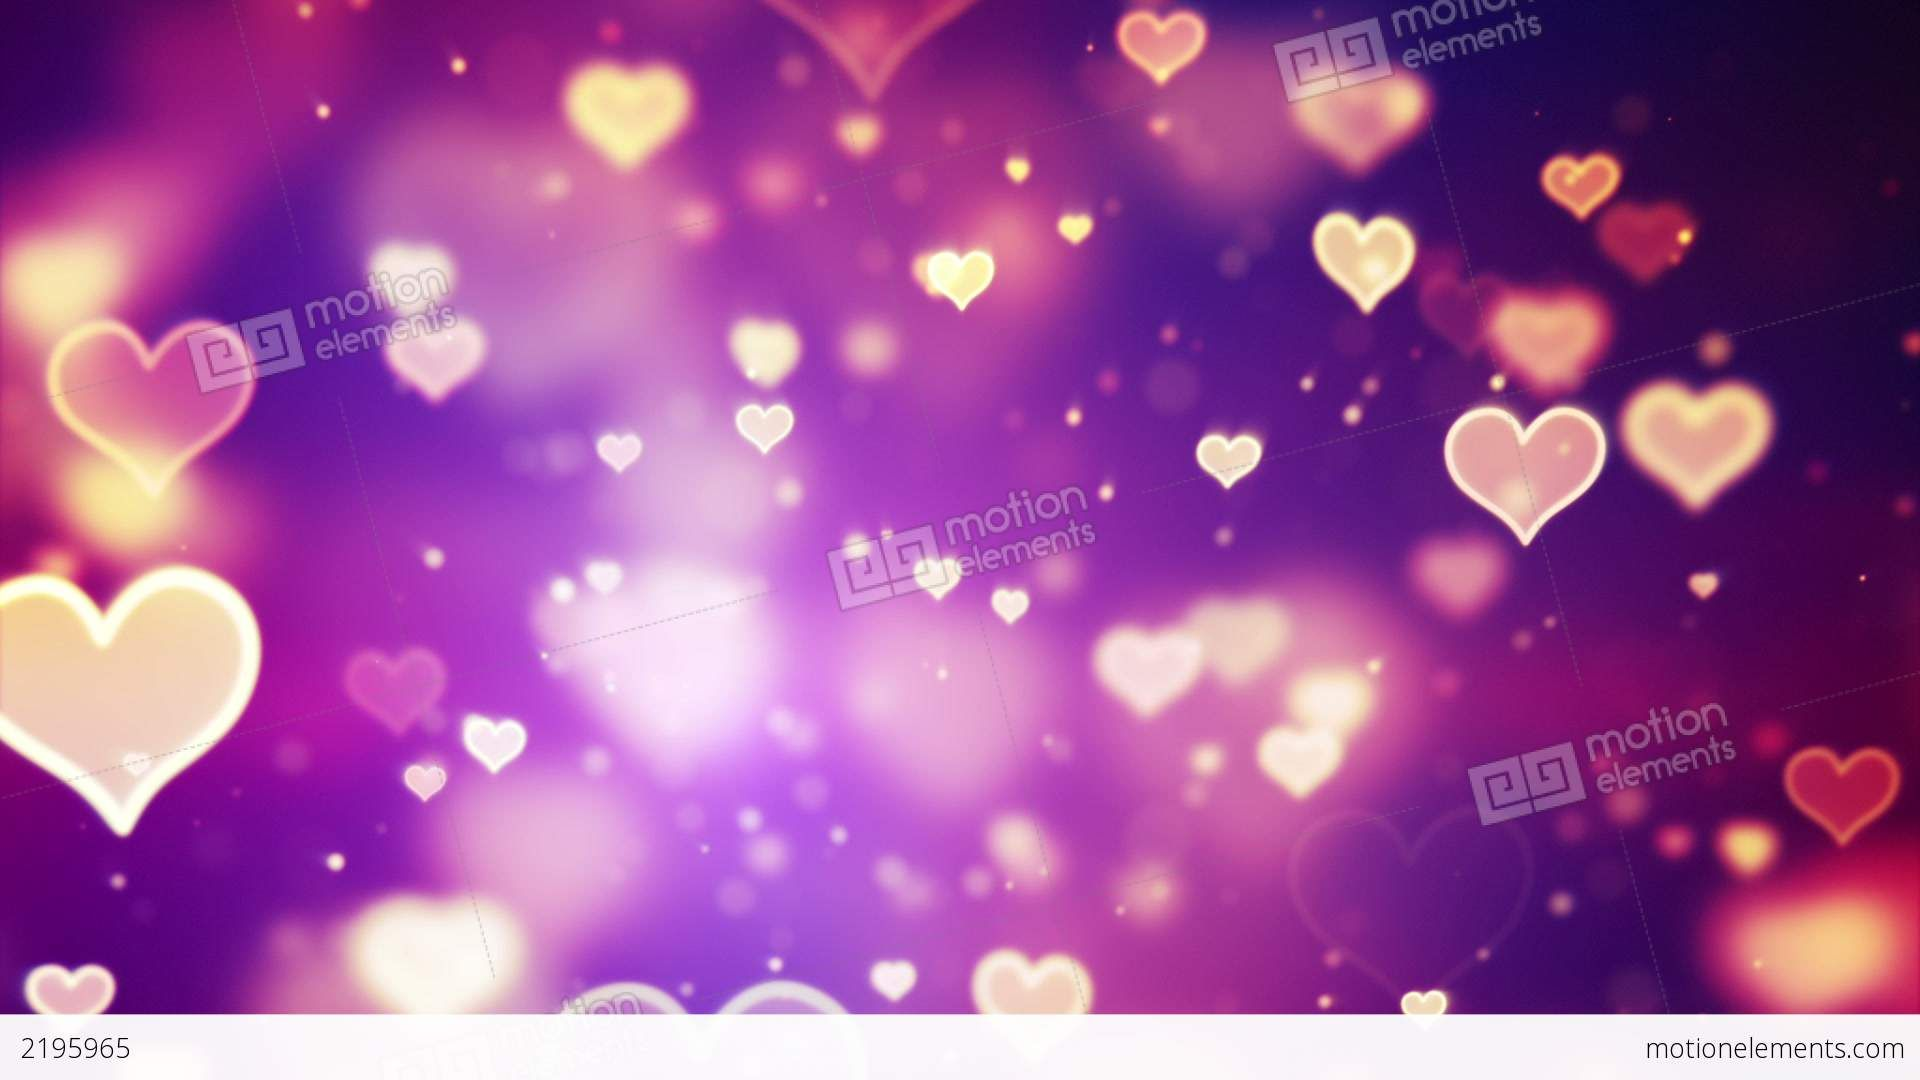 Romantic Background Images Wallpaperpulse Romantic Background Background Images Background